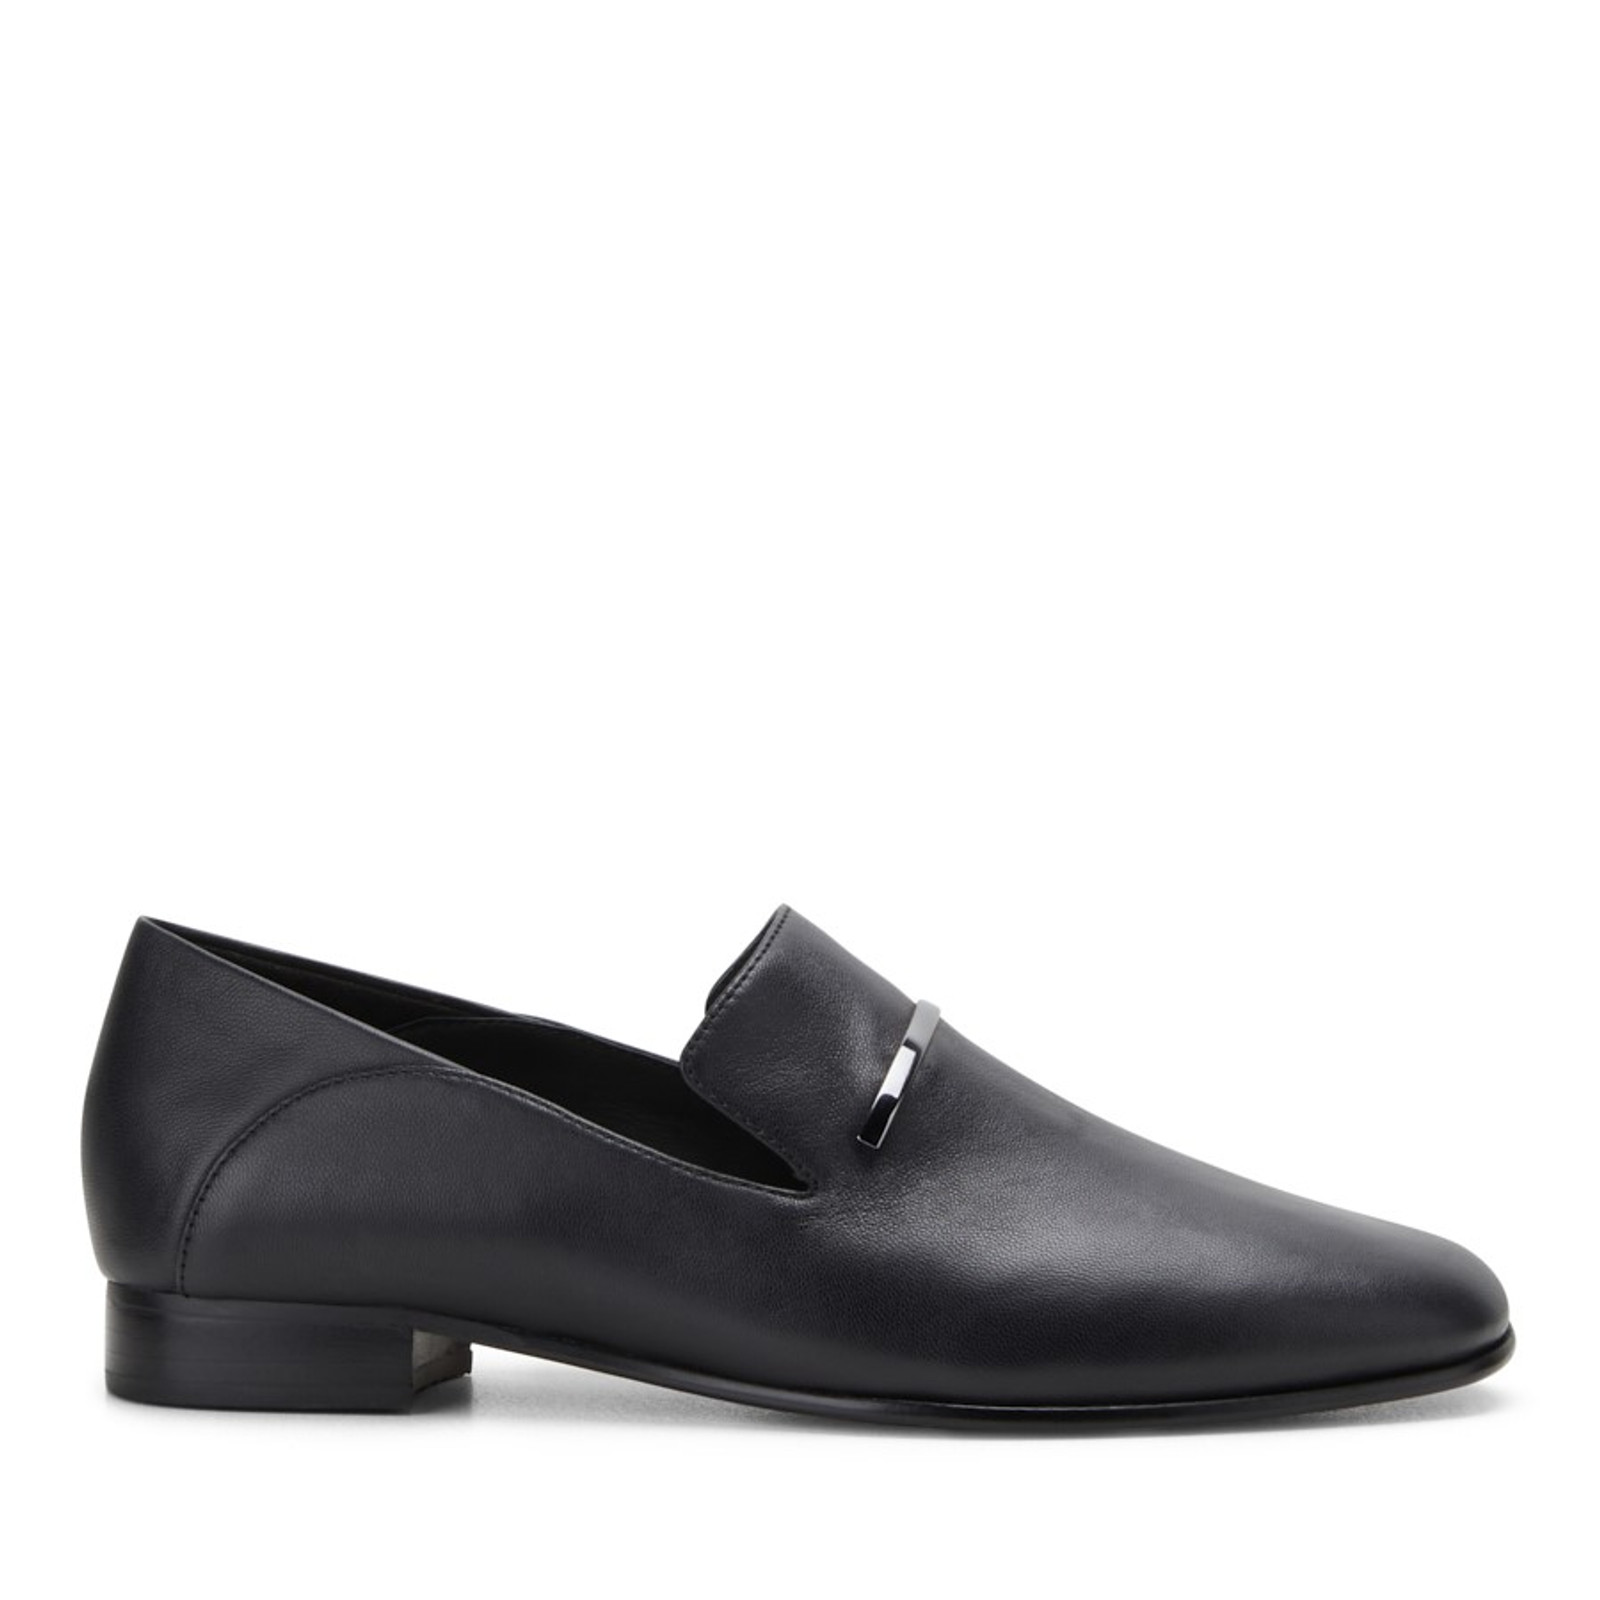 Clarks Womens PUREVIOLA TRIM Black Leather